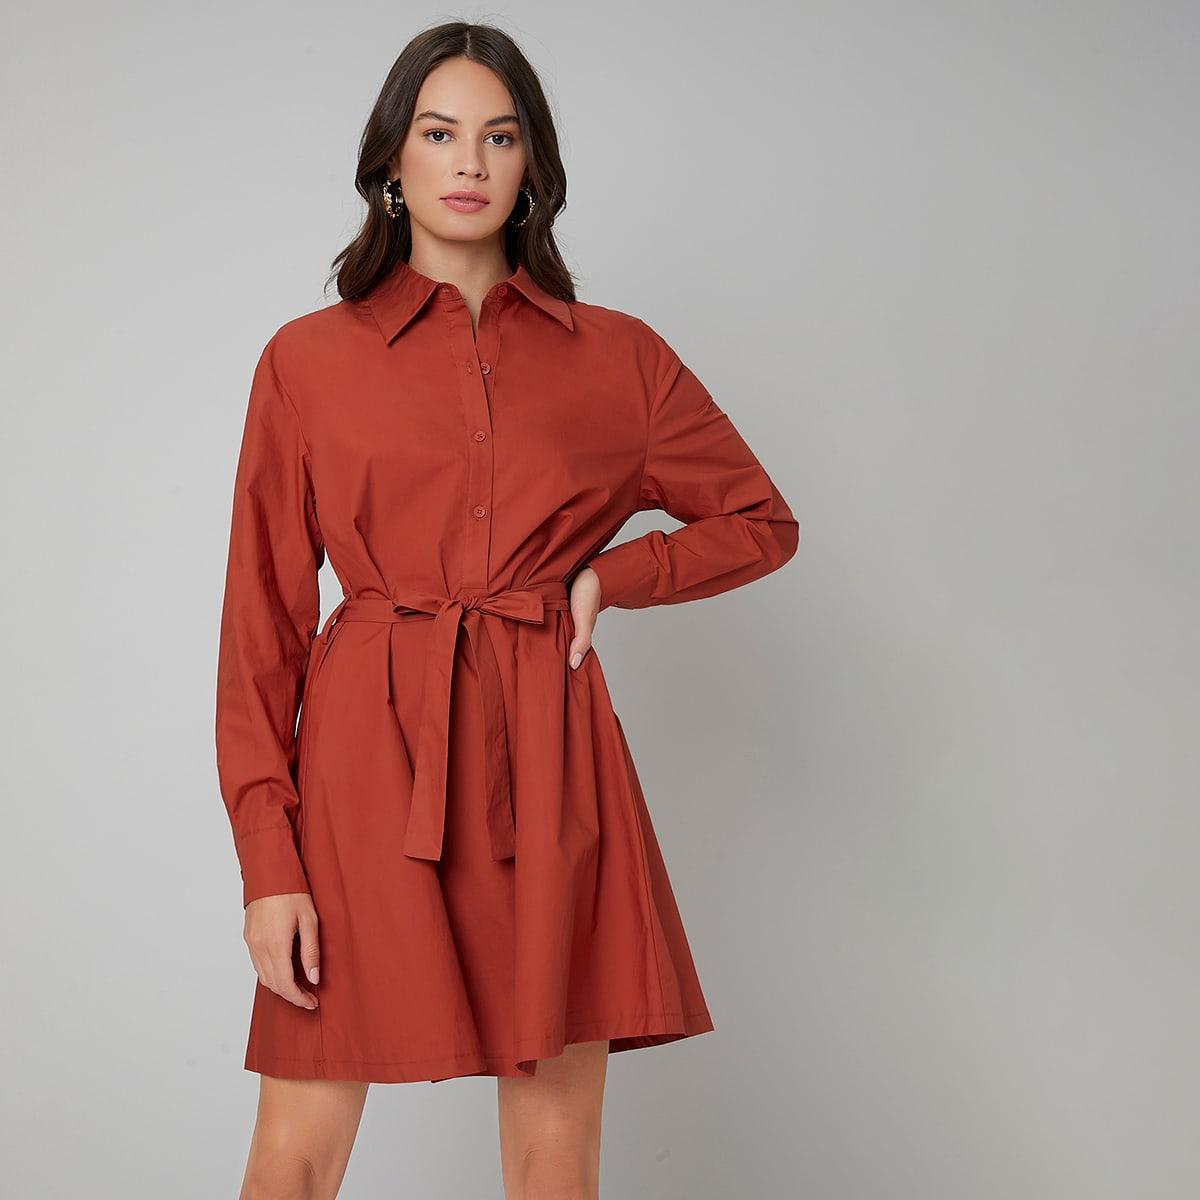 Solid Belted Shirt Dress